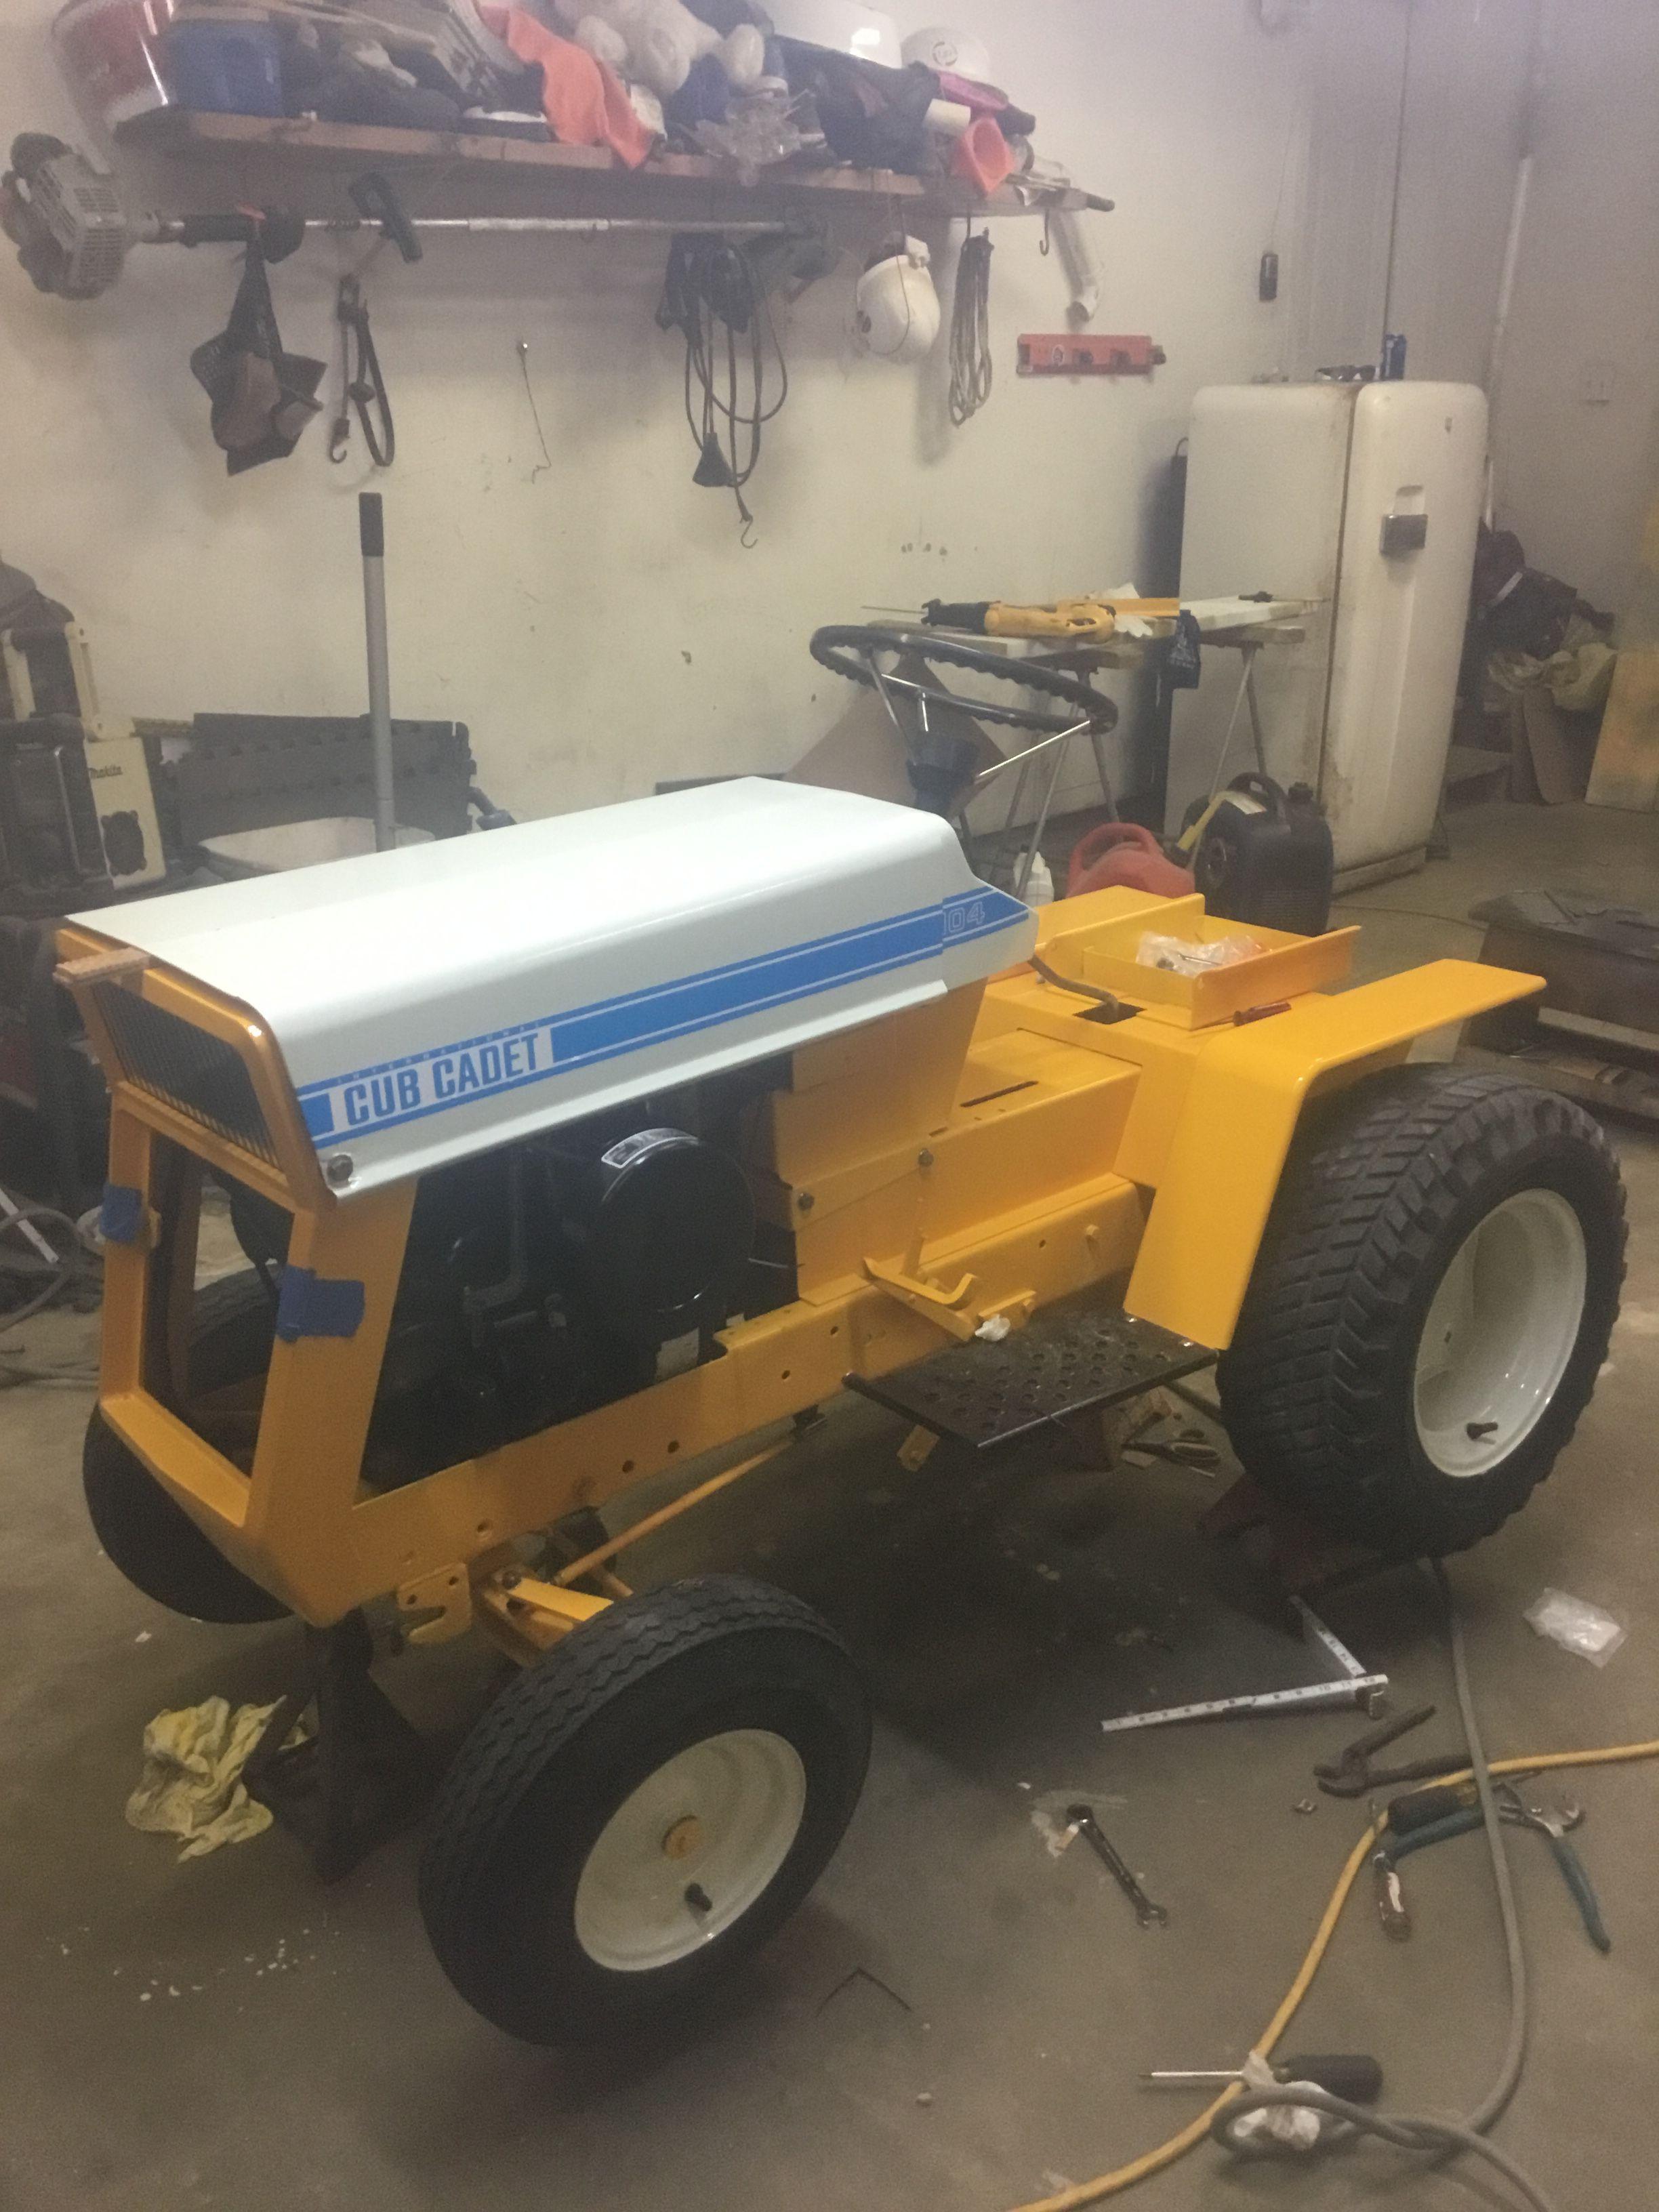 hight resolution of cub cadet 122 tractor w hydraulics snow blower plow 48 mower tiller creeper tony b cub cadet garden tractors for sale tractors